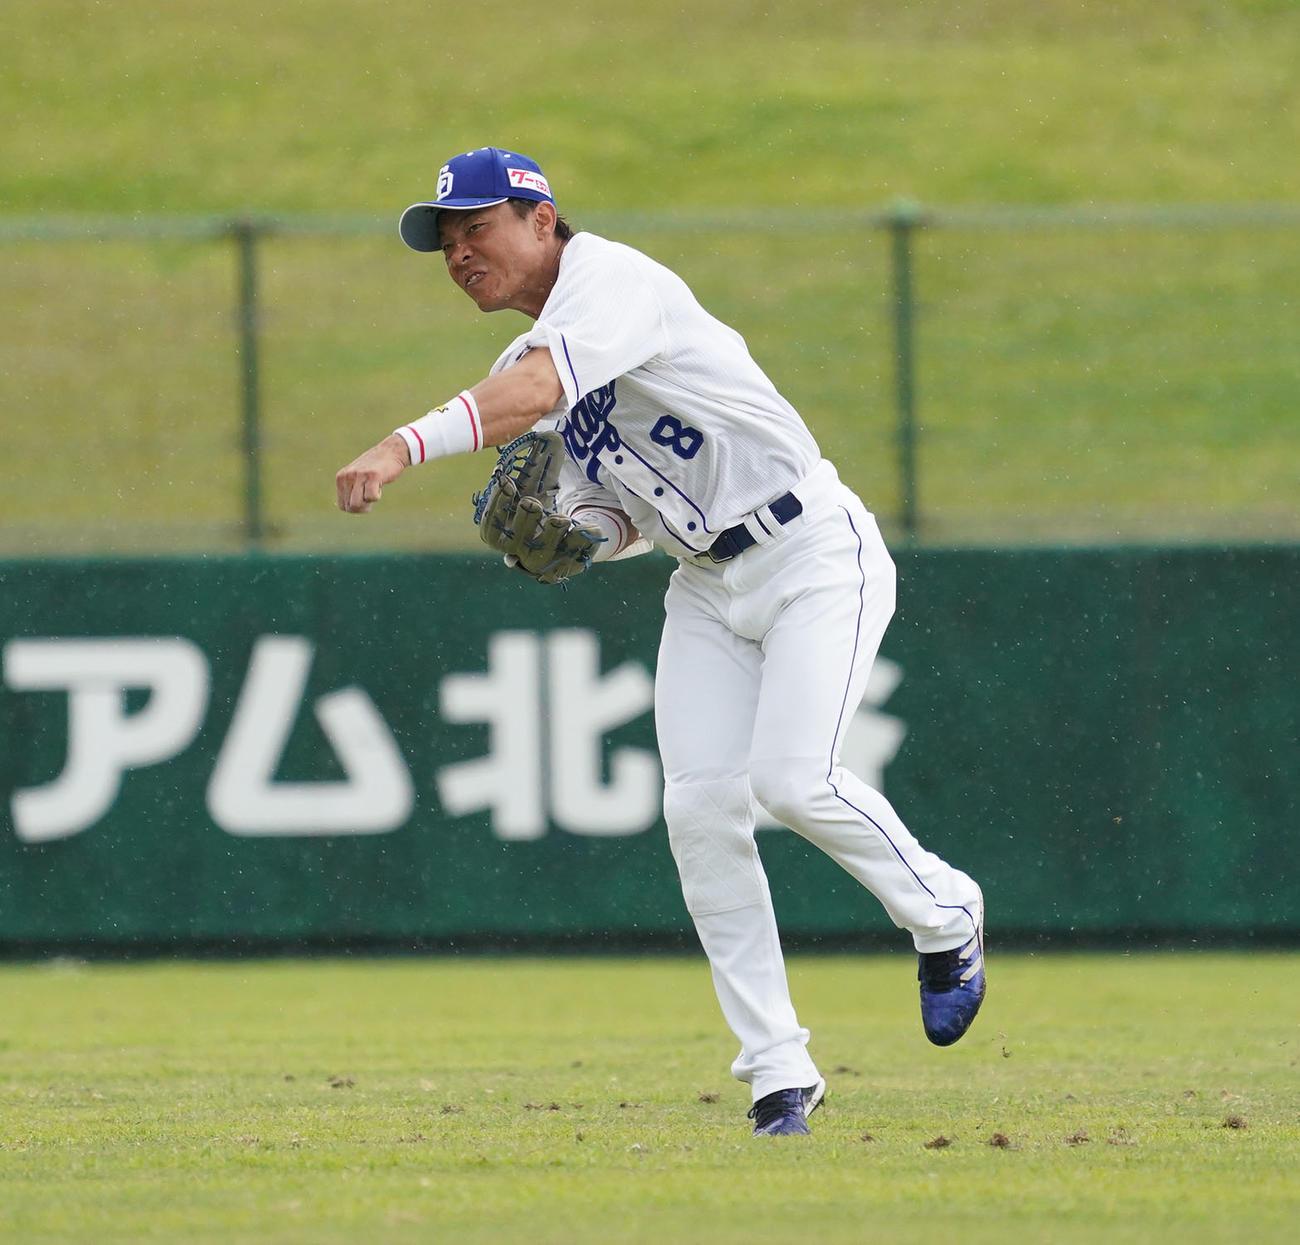 練習試合・中日対楽天 5回表楽天1死二塁、田中和基の打球を捕球し本塁へ送球する大島洋平(撮影・森本幸一)